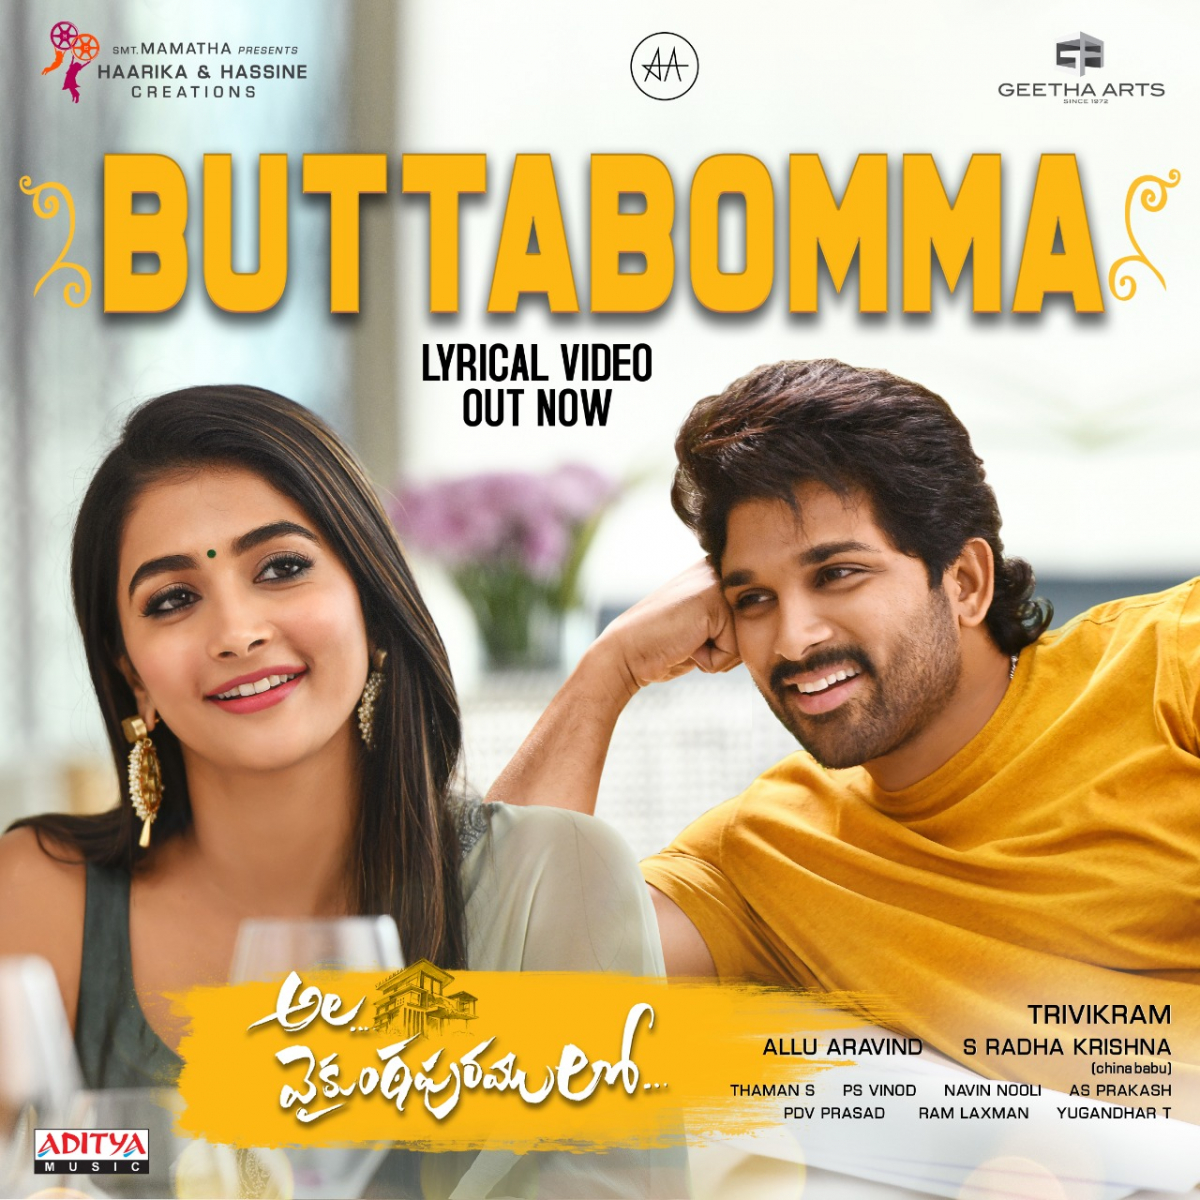 'Butta Bomma' song from Allu Arjun's Ala Vaikunthapurramuloo Poster.